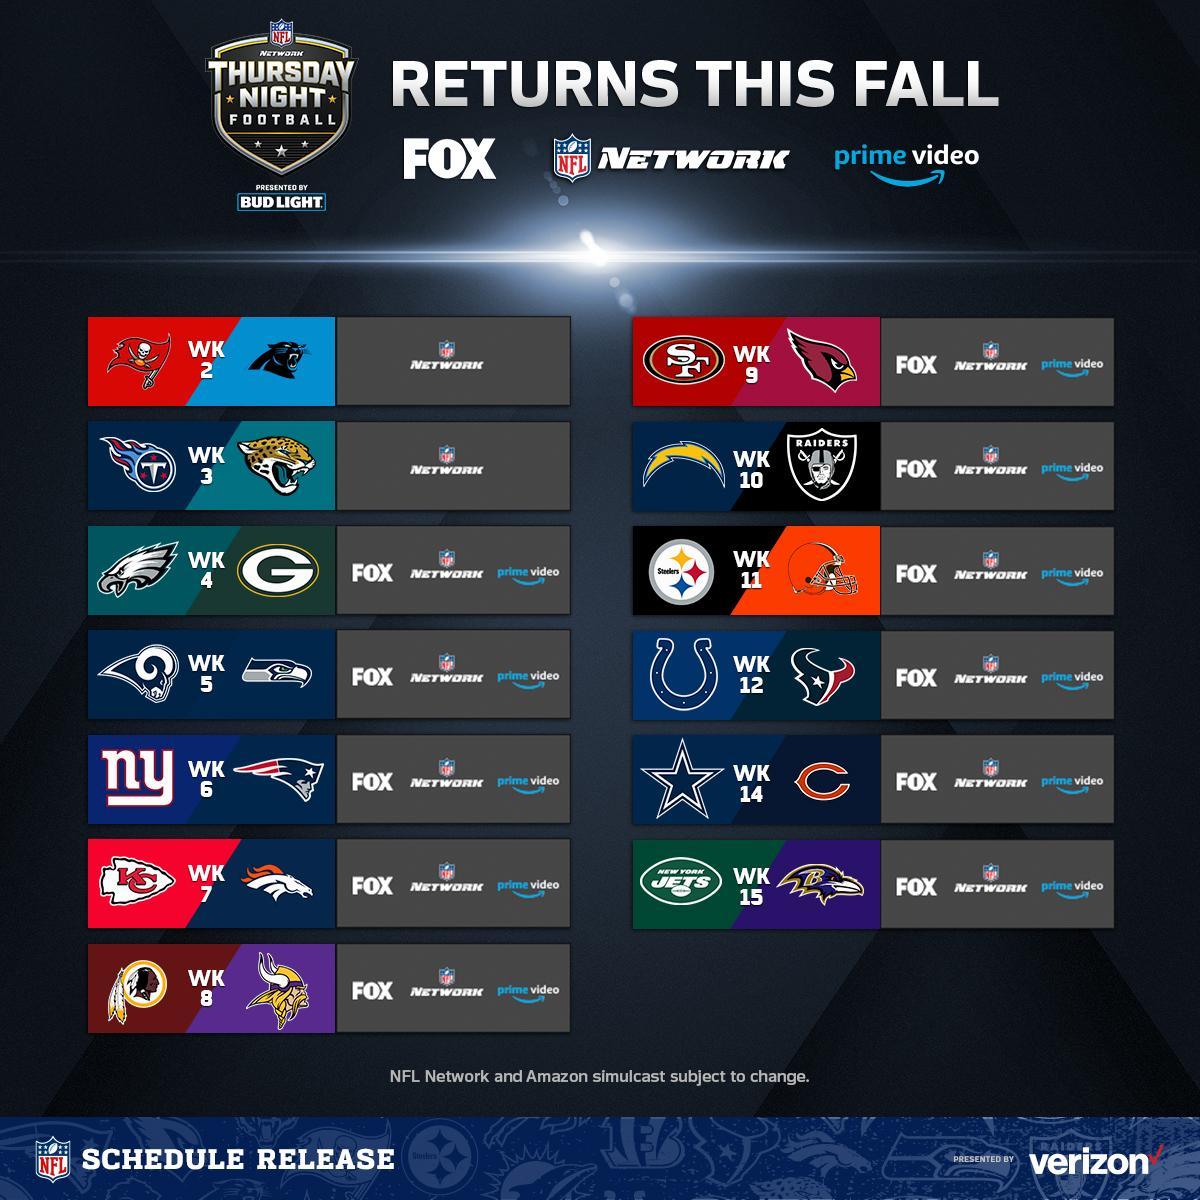 Thursday Night Football!  #NFLScheduleRelease  (by @verizon)<br>http://pic.twitter.com/s30pUJSYg6